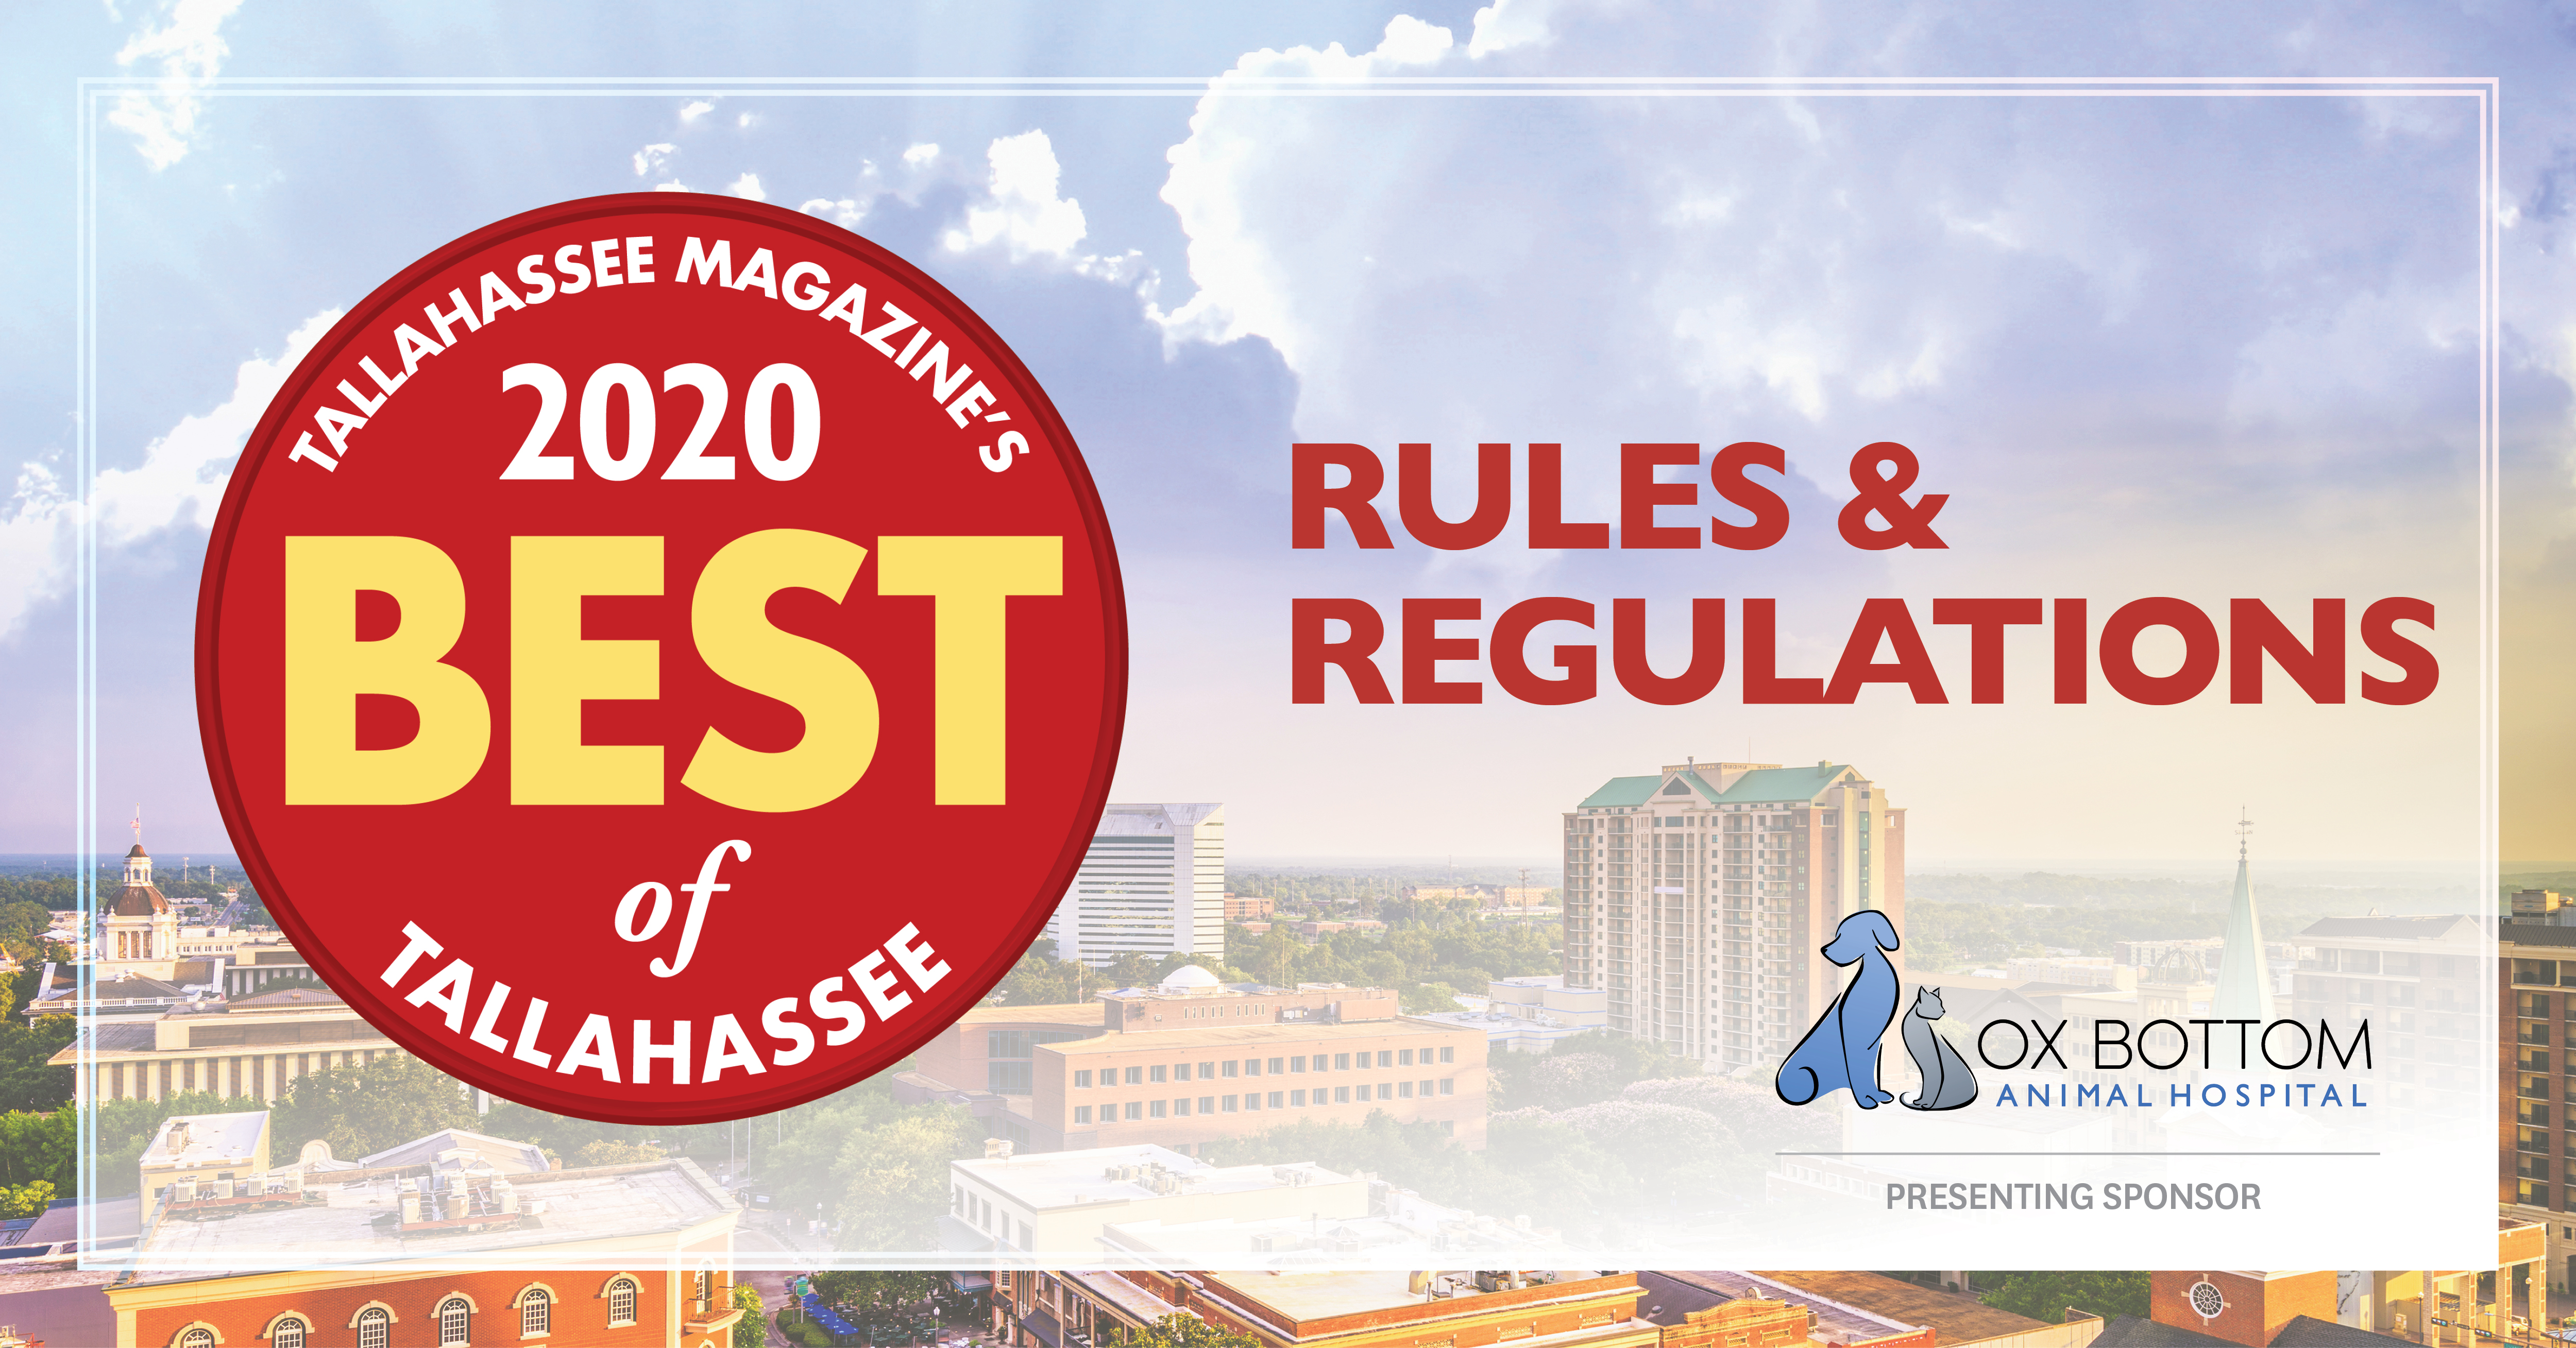 20bo Rules & Regulations Graphics 1200x628